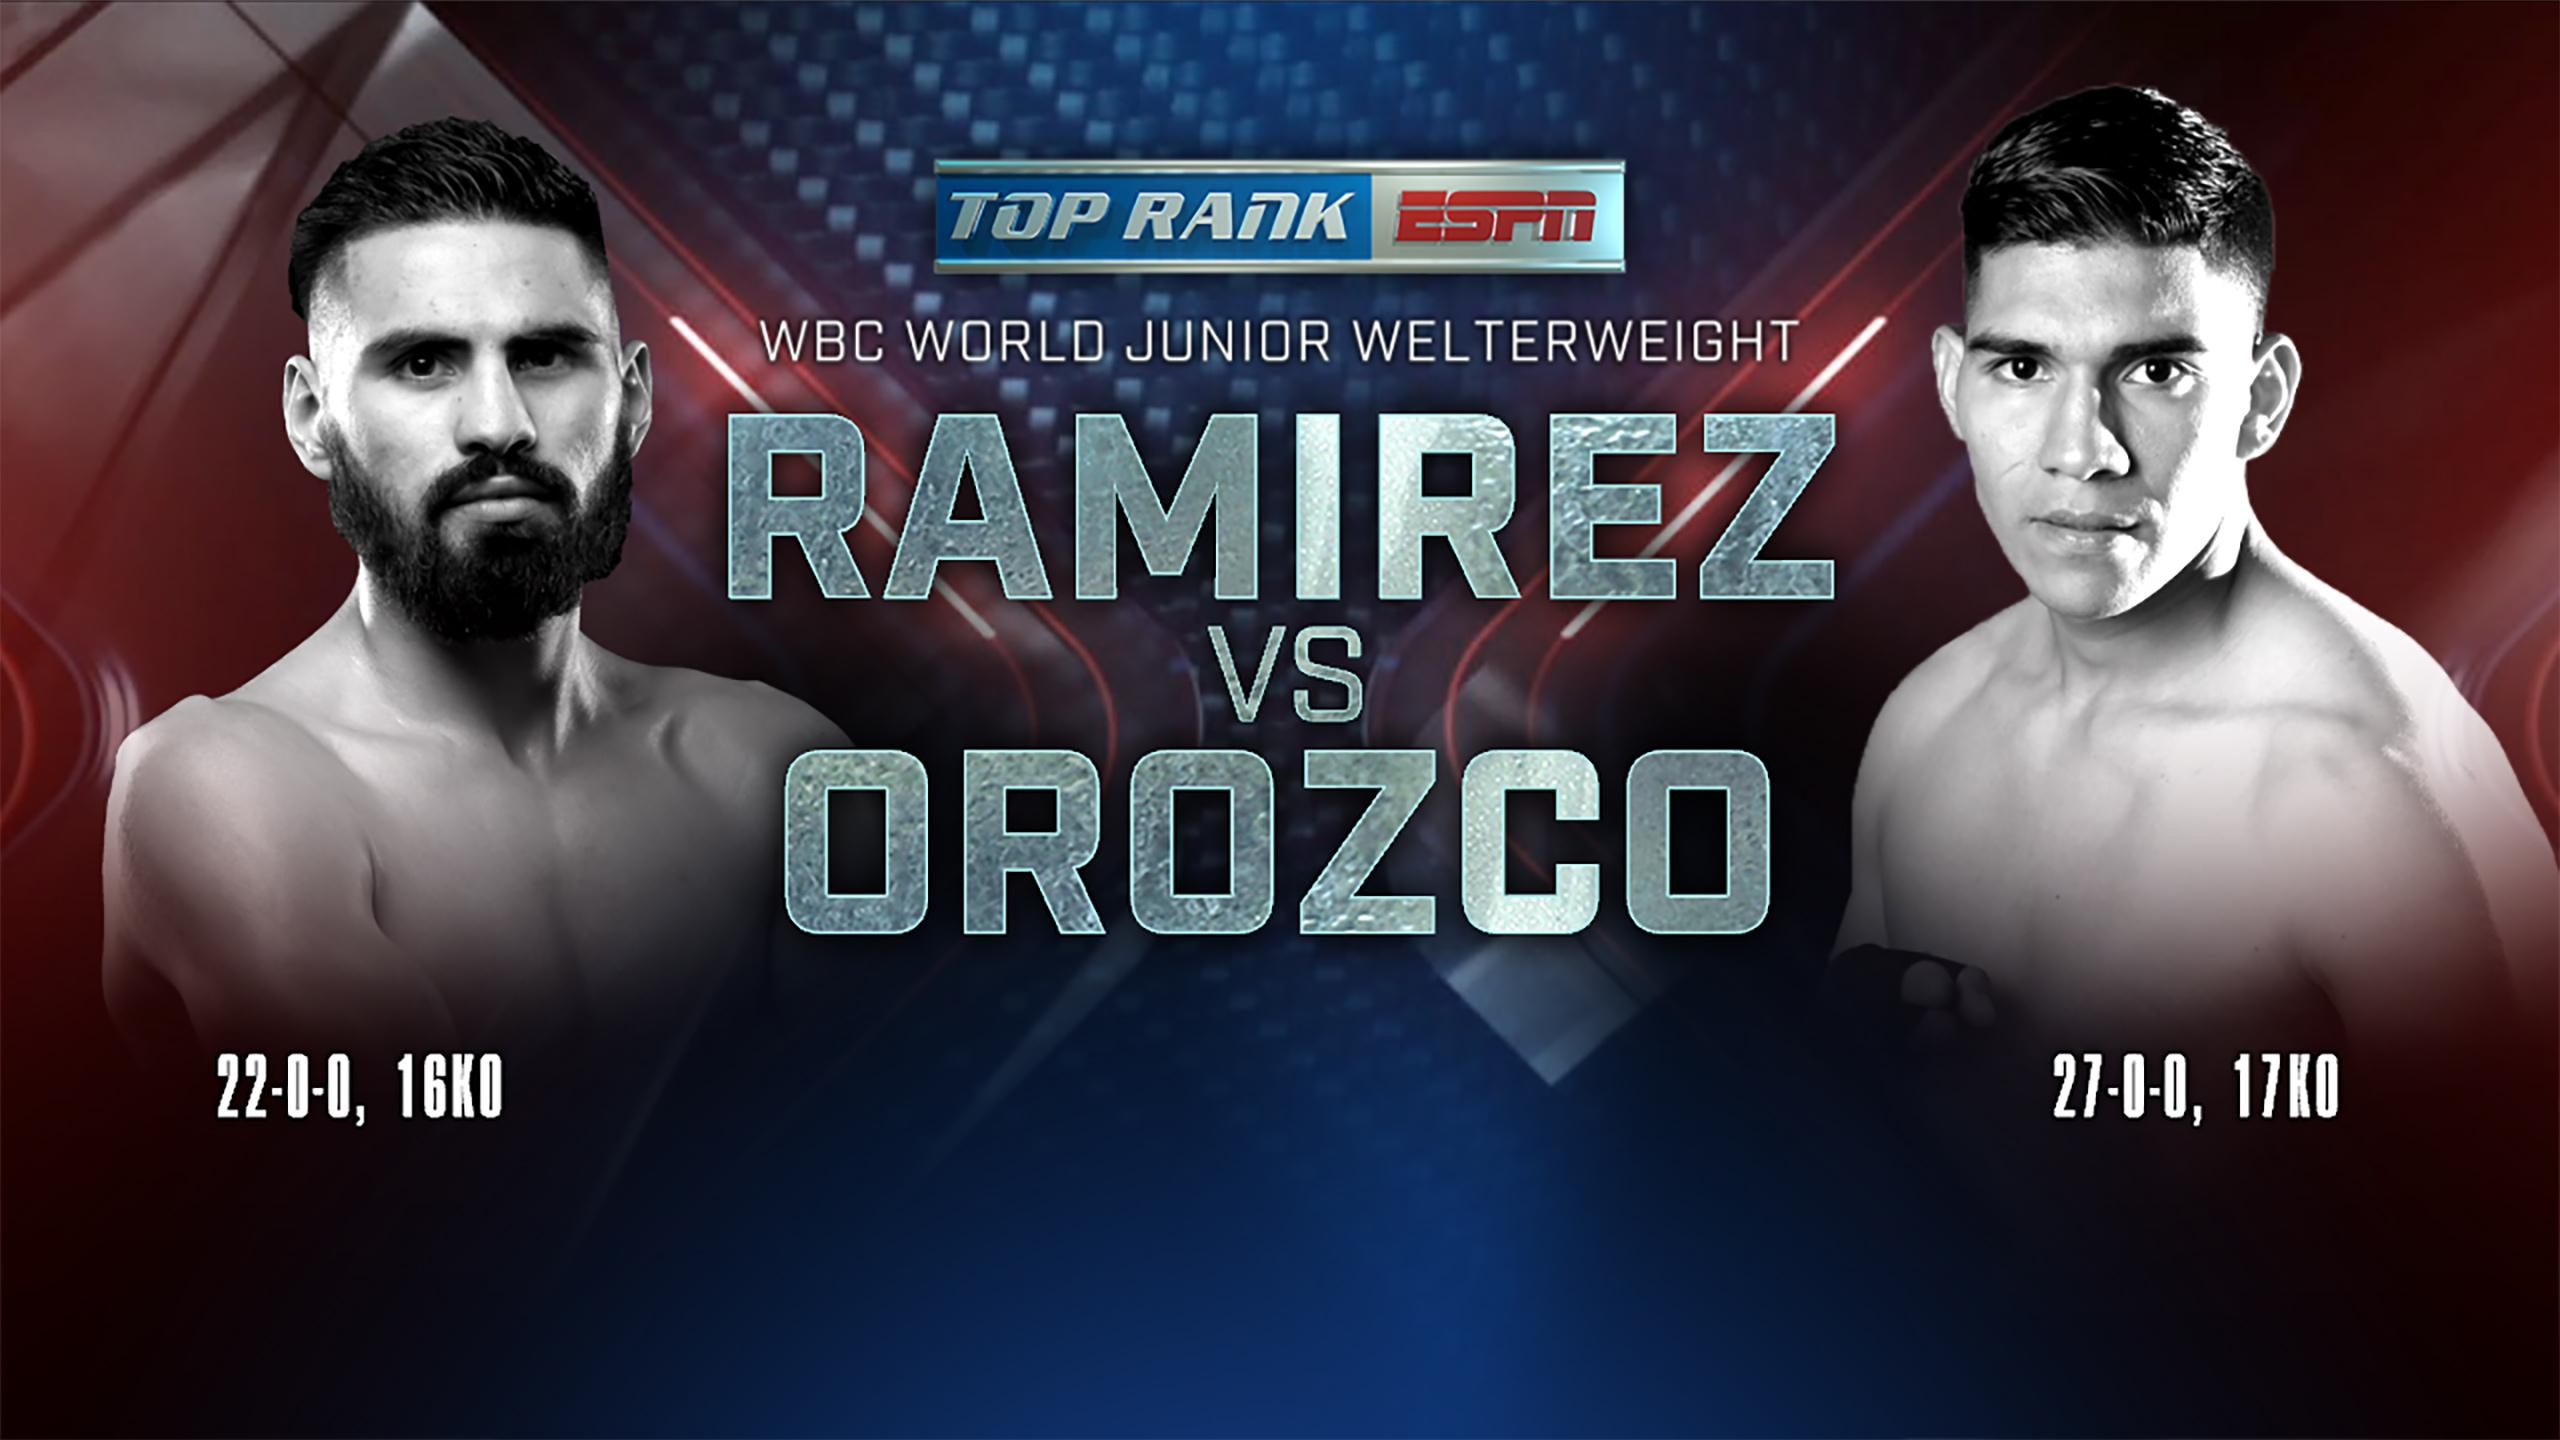 In Spanish - Jose Ramirez vs. Antonio Orozco